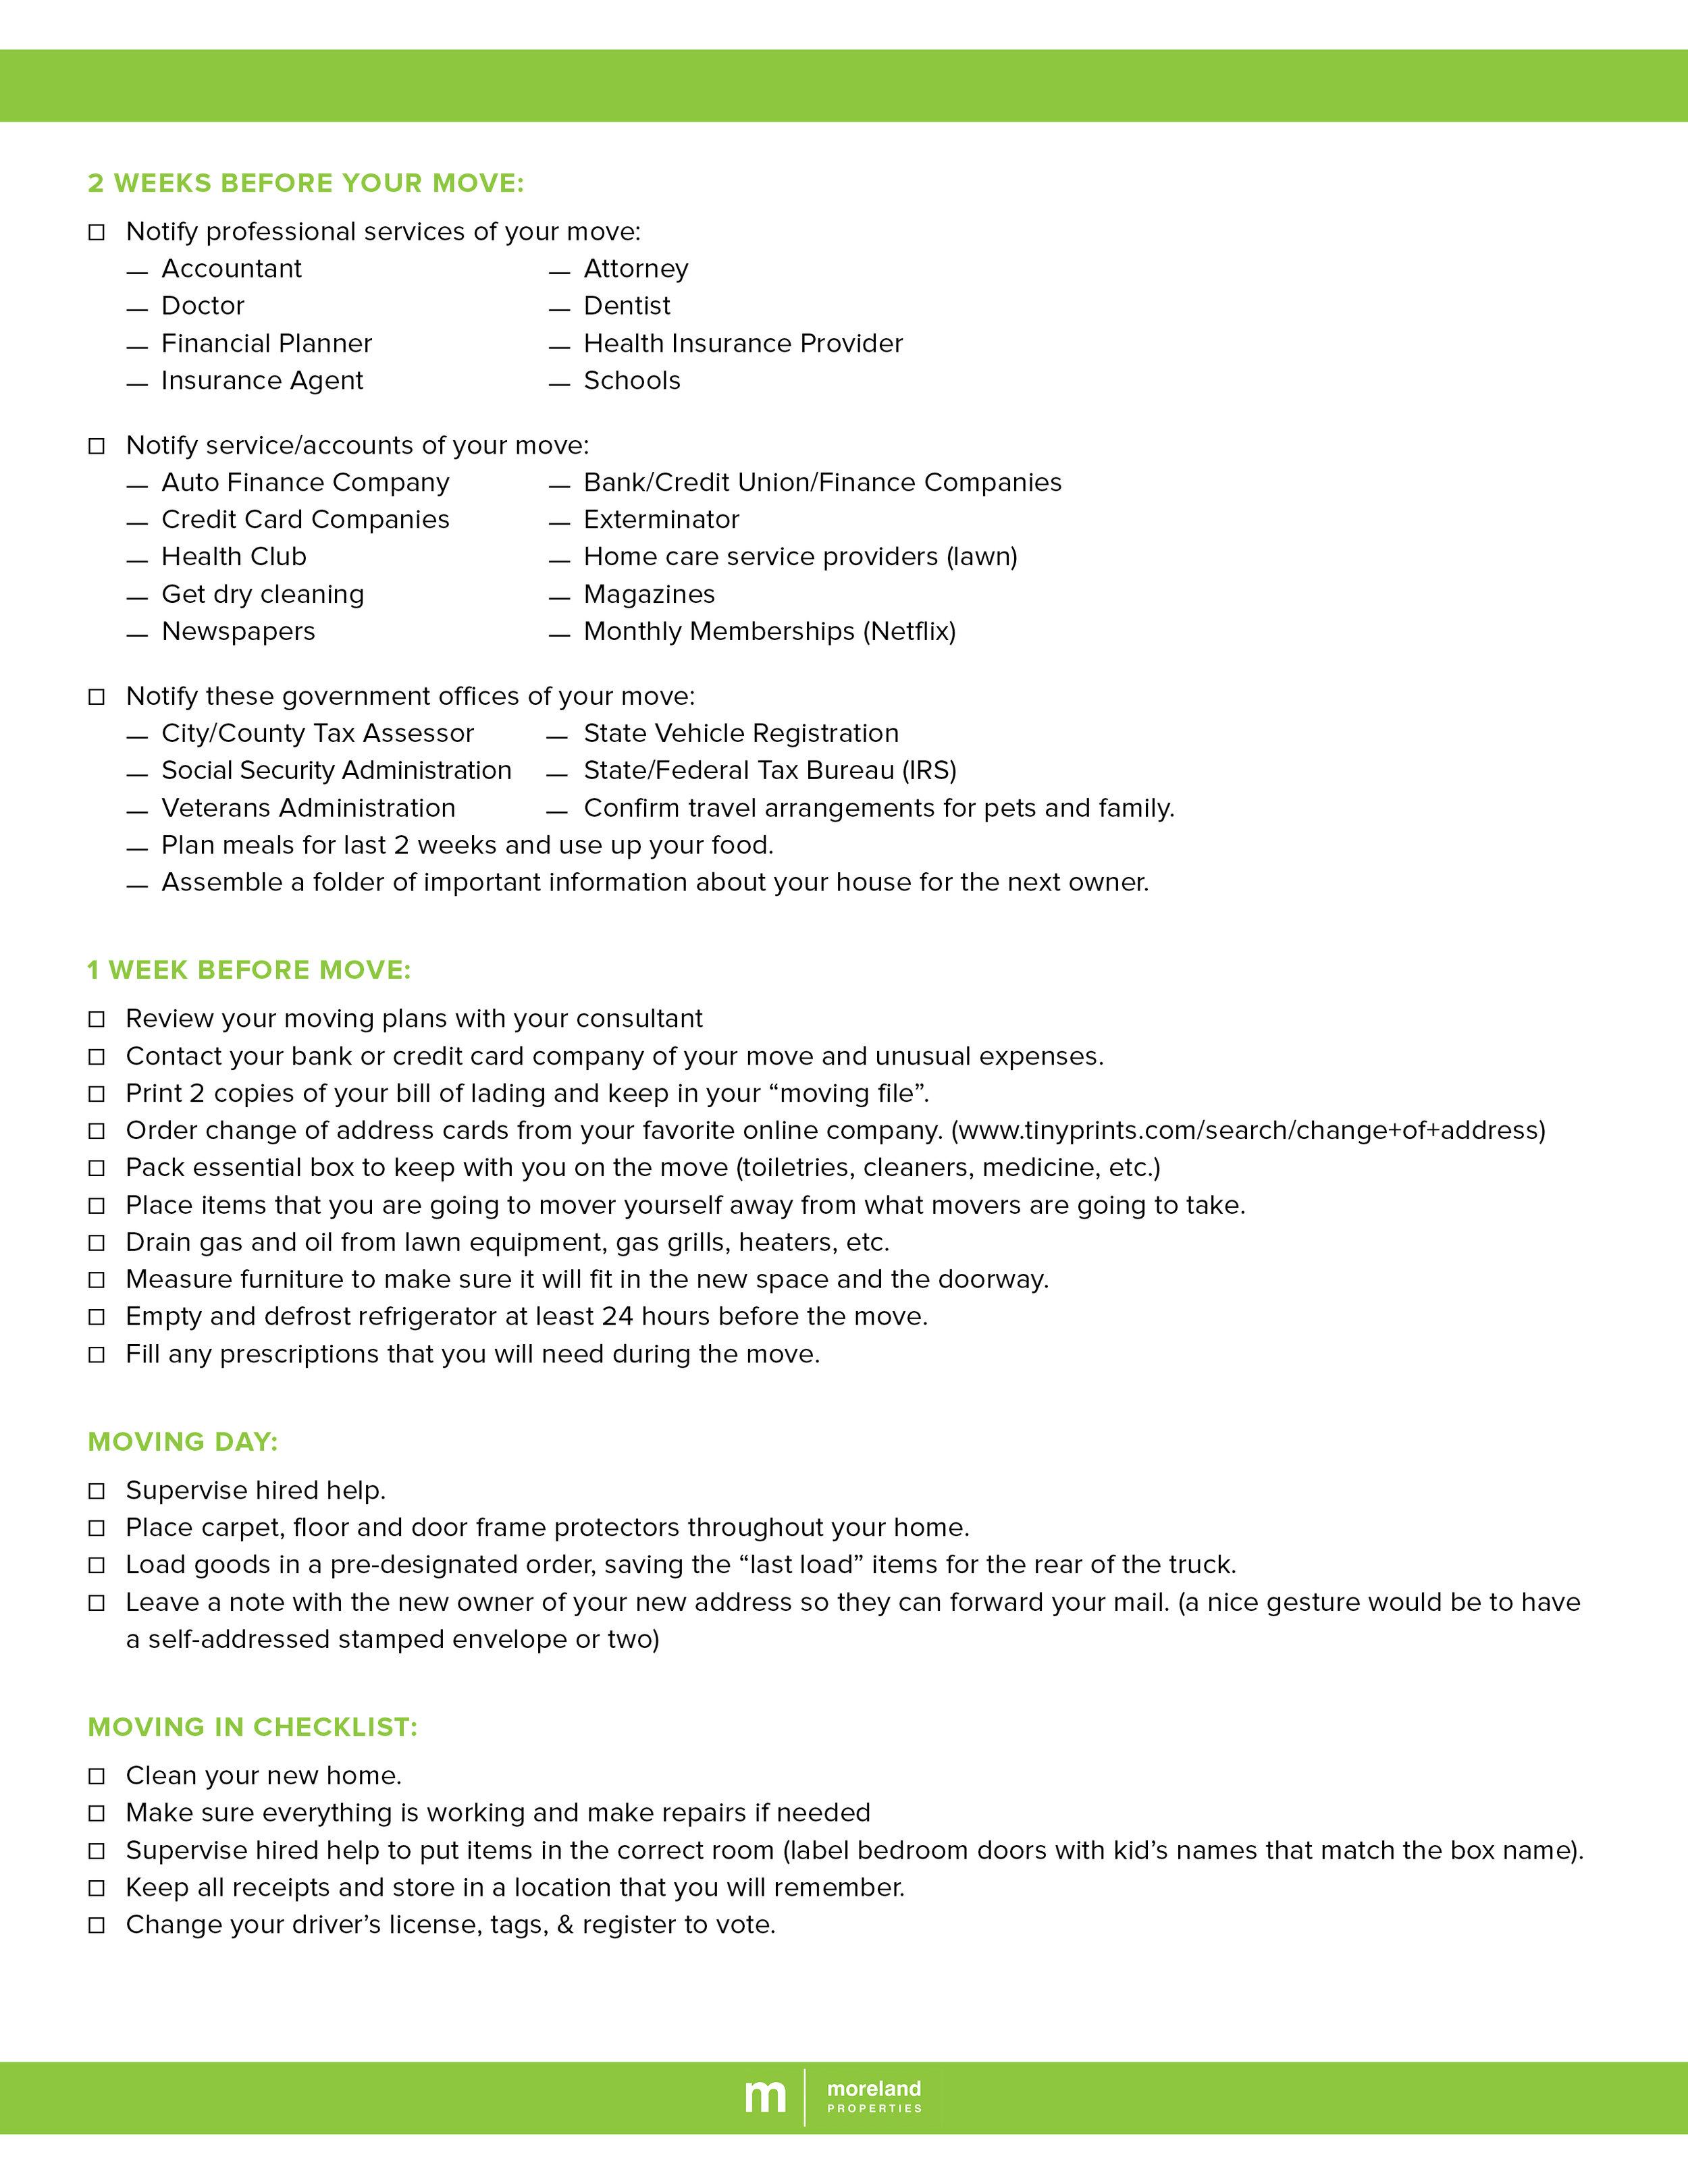 Moving Checklist - Long Distance2.jpg